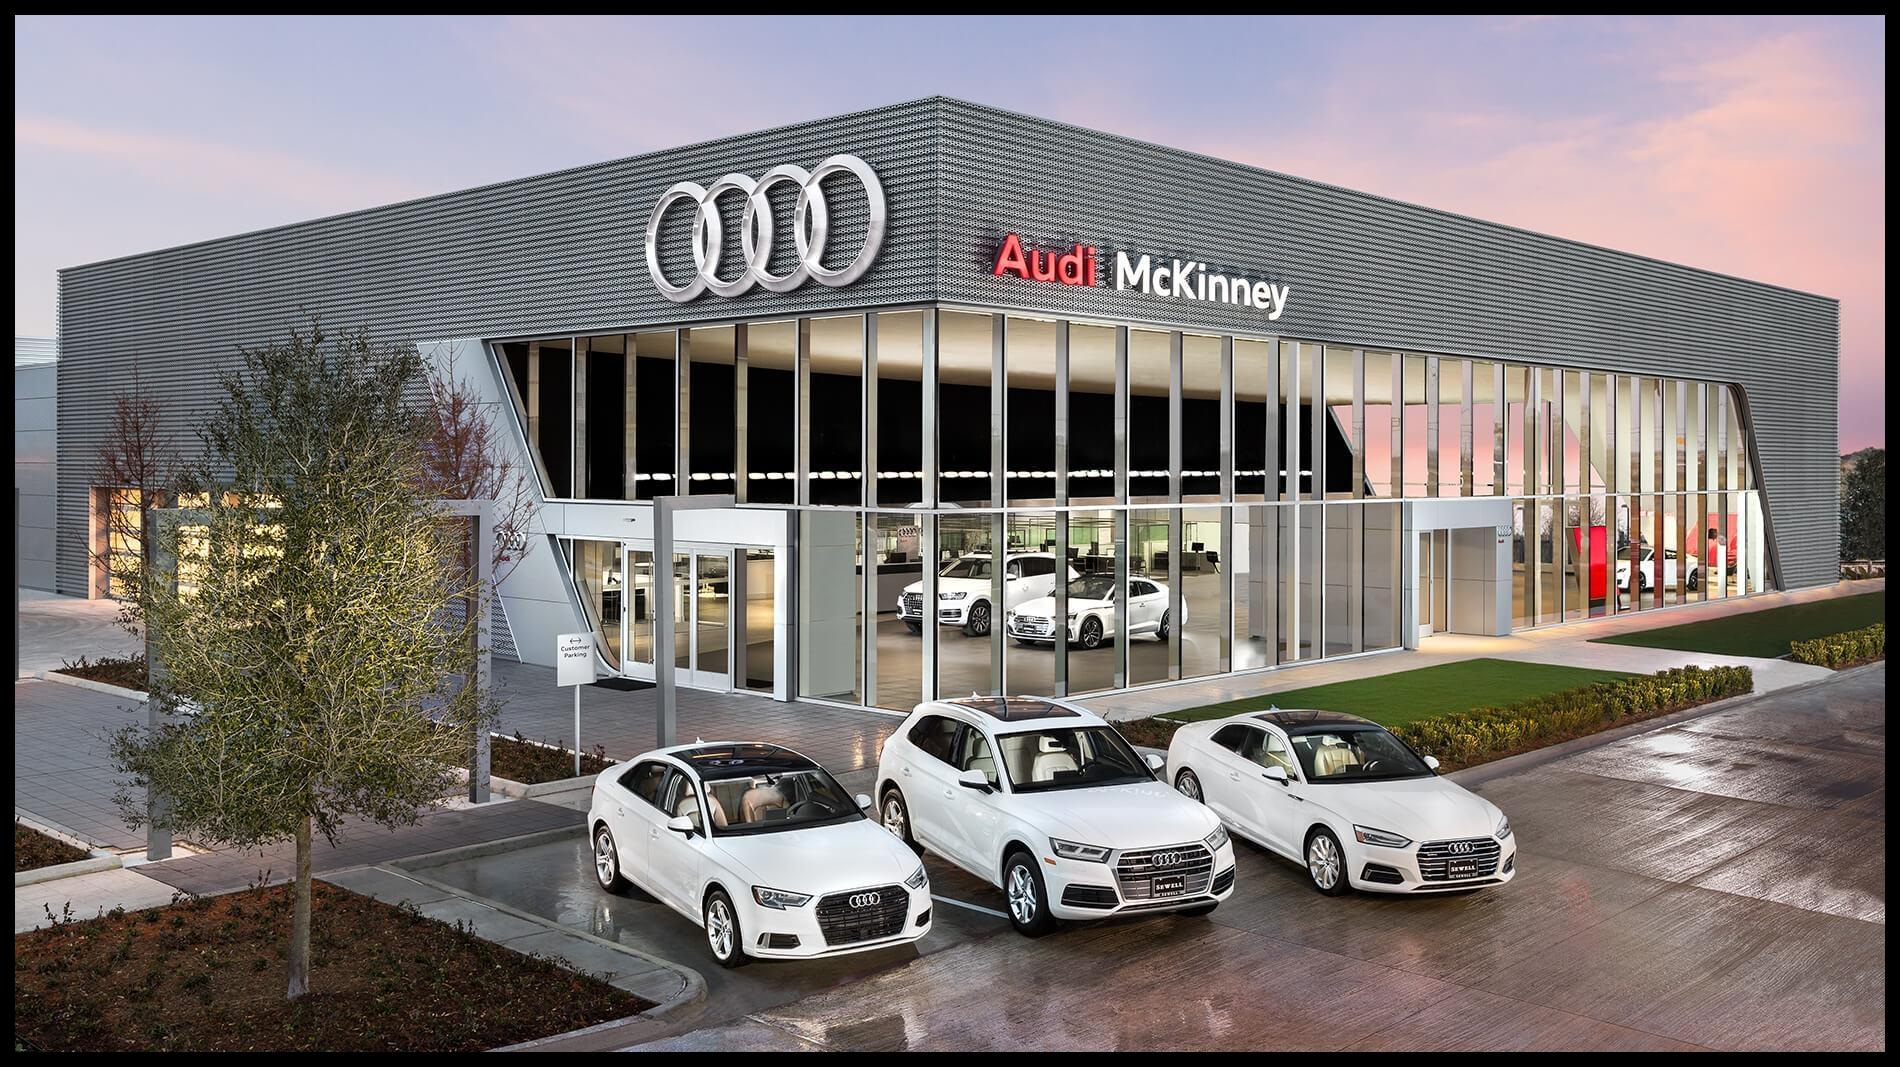 Sewell Audi McKinney Exterior